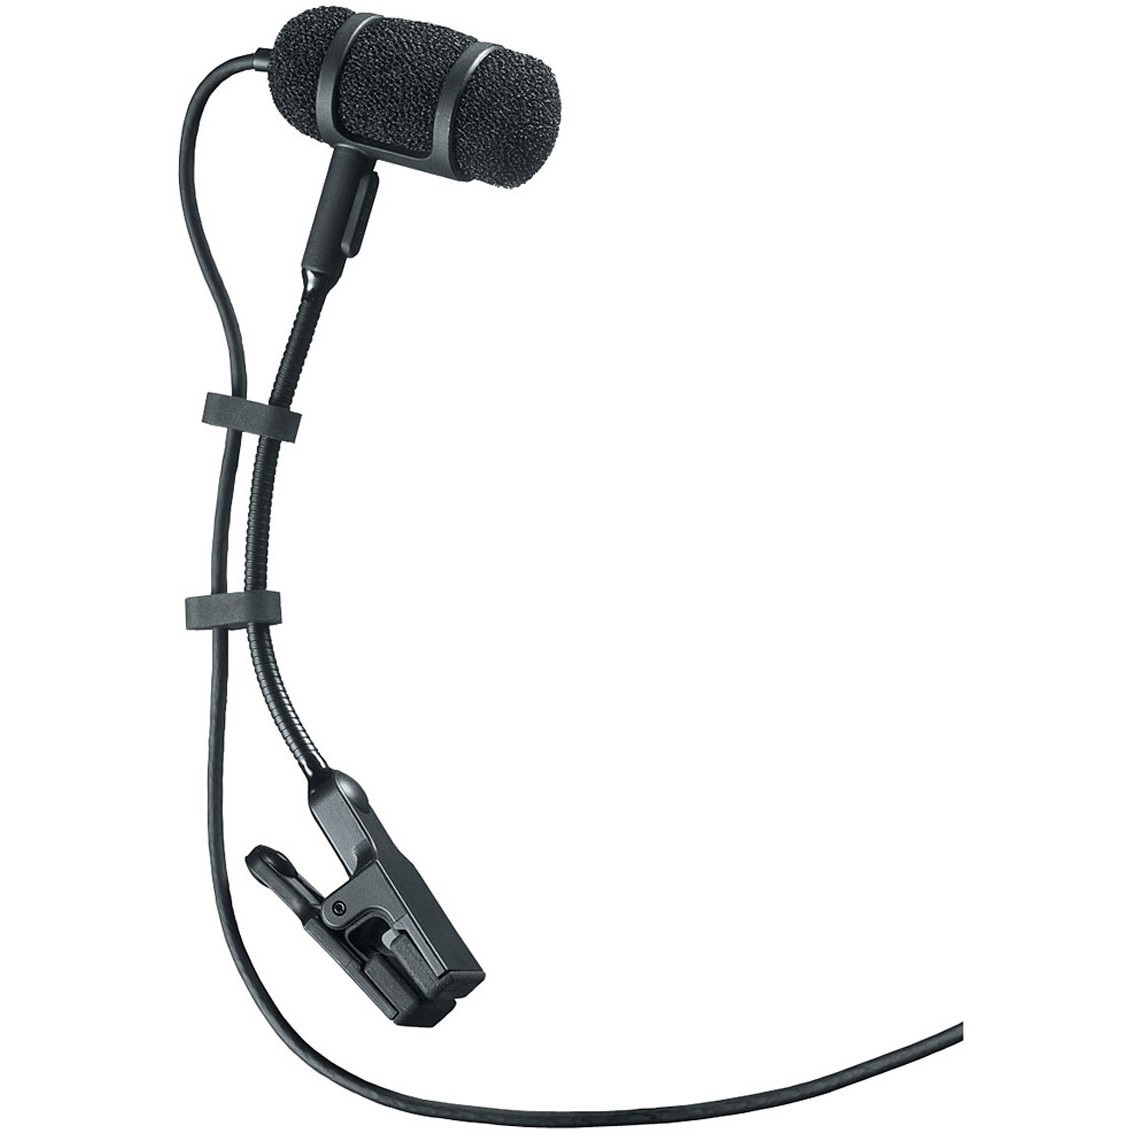 Audio-Technica PRO 35 cW